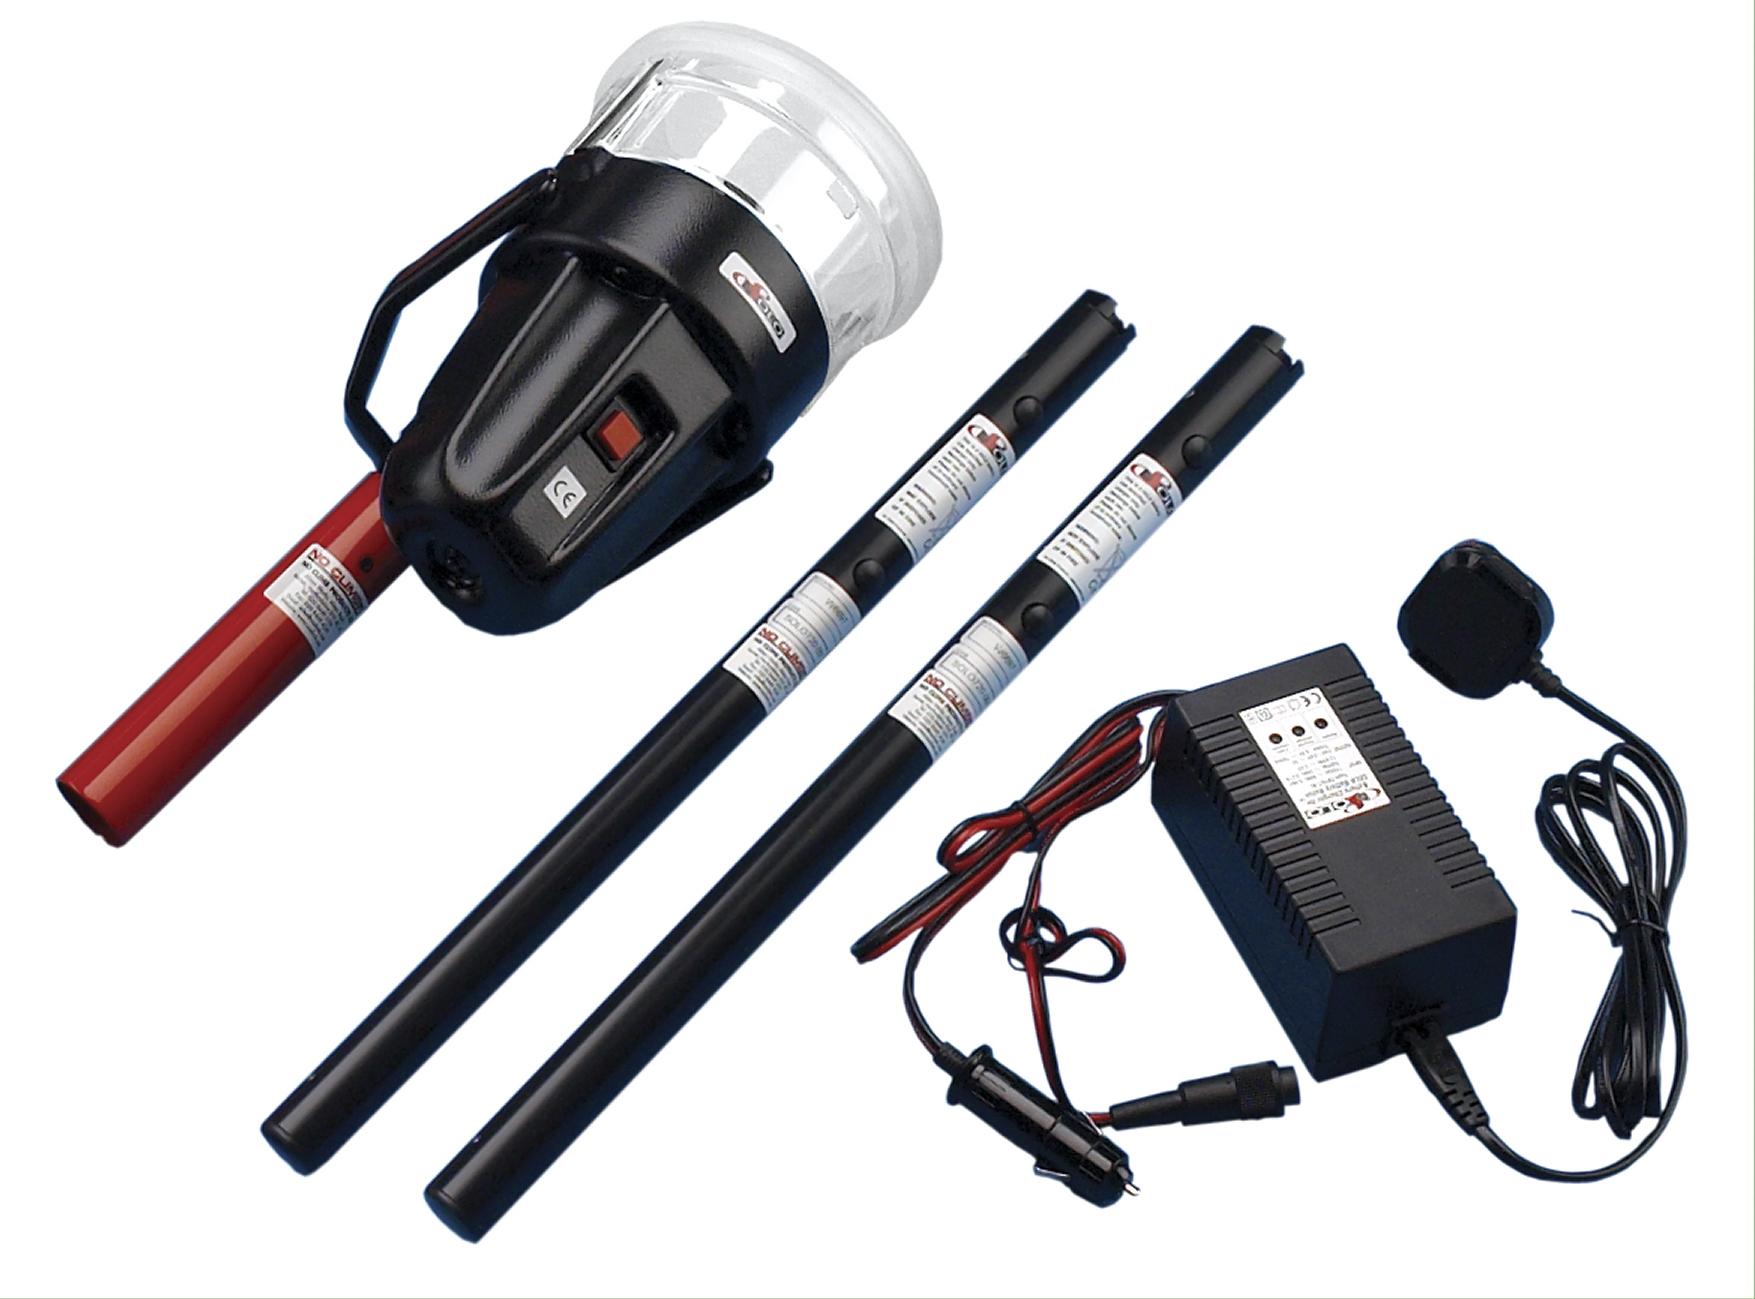 Solo 461 Heat Detector Testing Kit